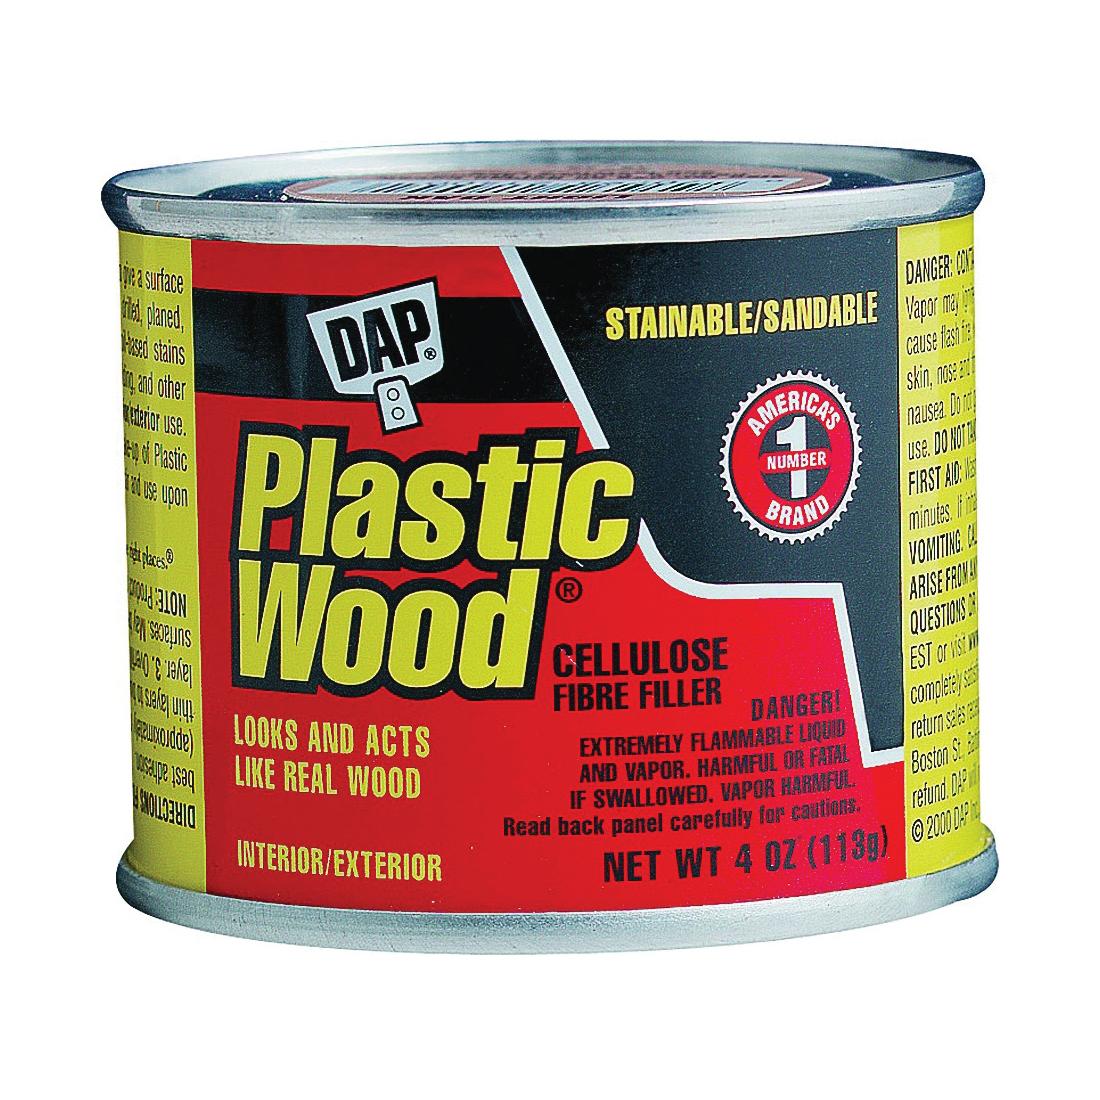 Picture of DAP Plastic Wood 21400 Wood Filler, Paste, Strong Solvent, Light Oak, 4 oz Package